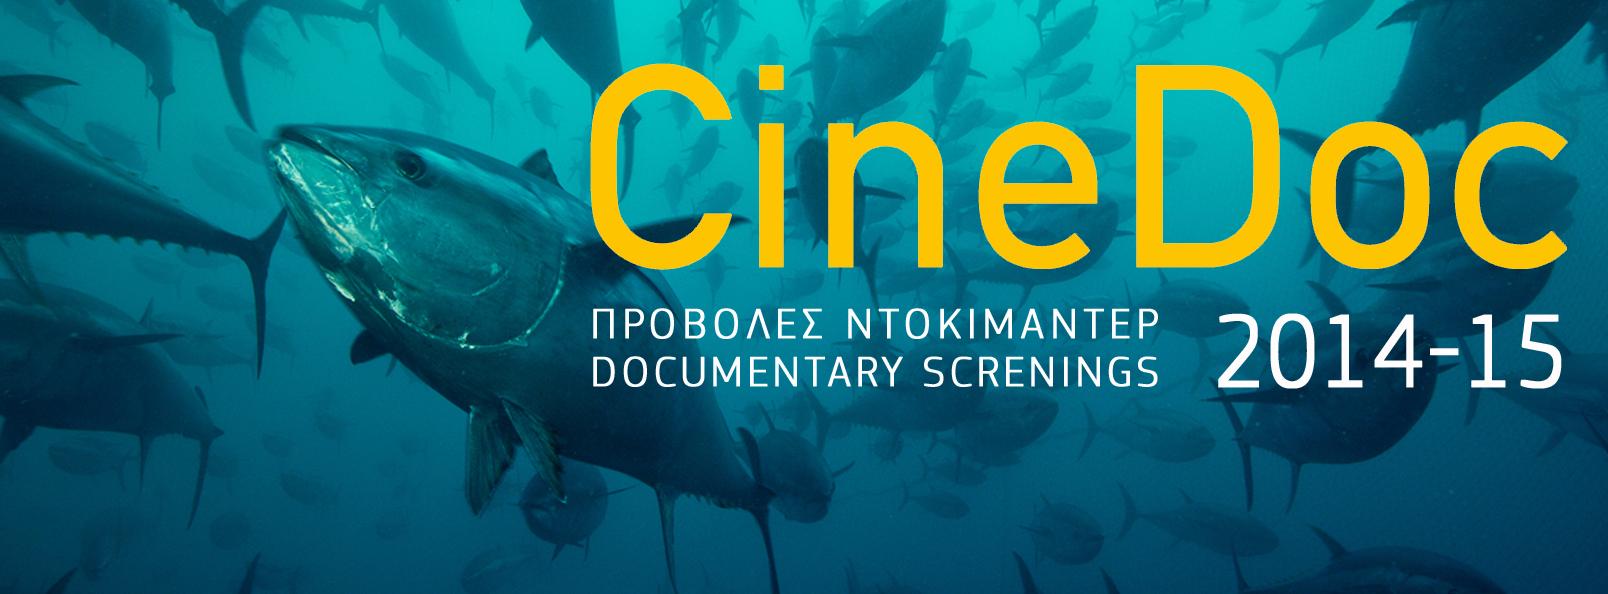 Trailer 2014-2015